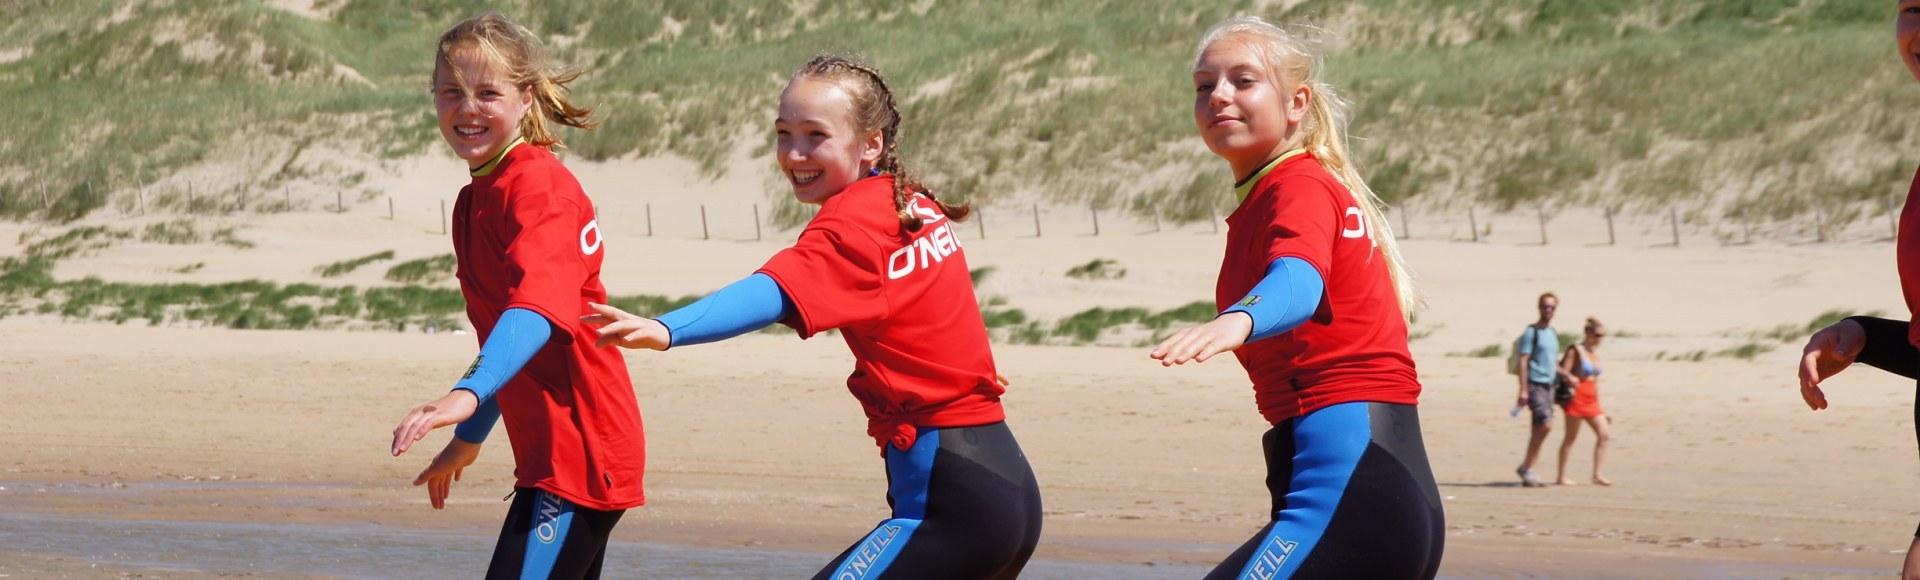 Surf Lessen Bloemendaal